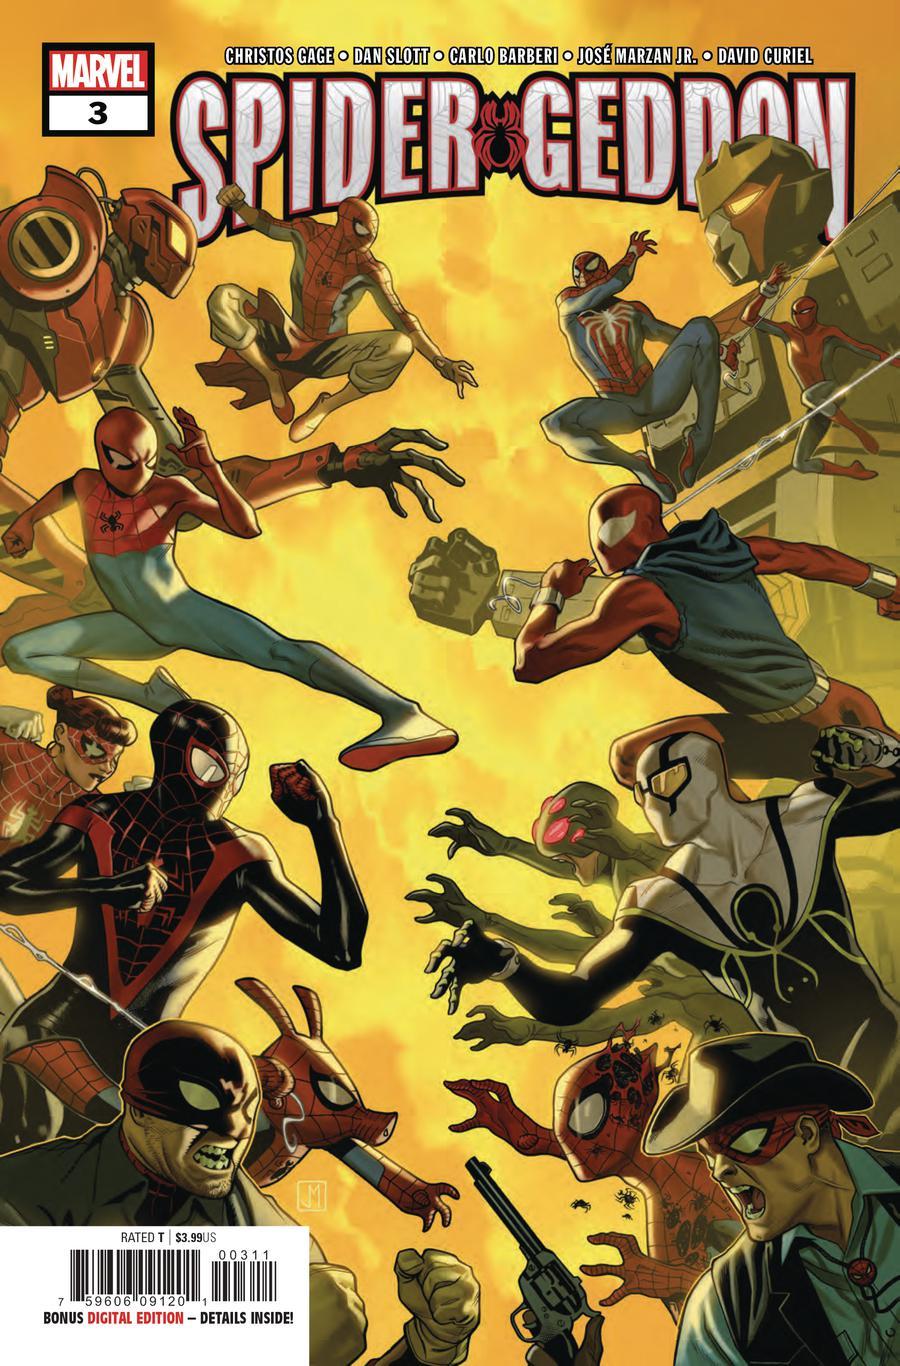 Spider-Geddon #3 Cover A 1st Ptg Regular Jorge Molina Cover